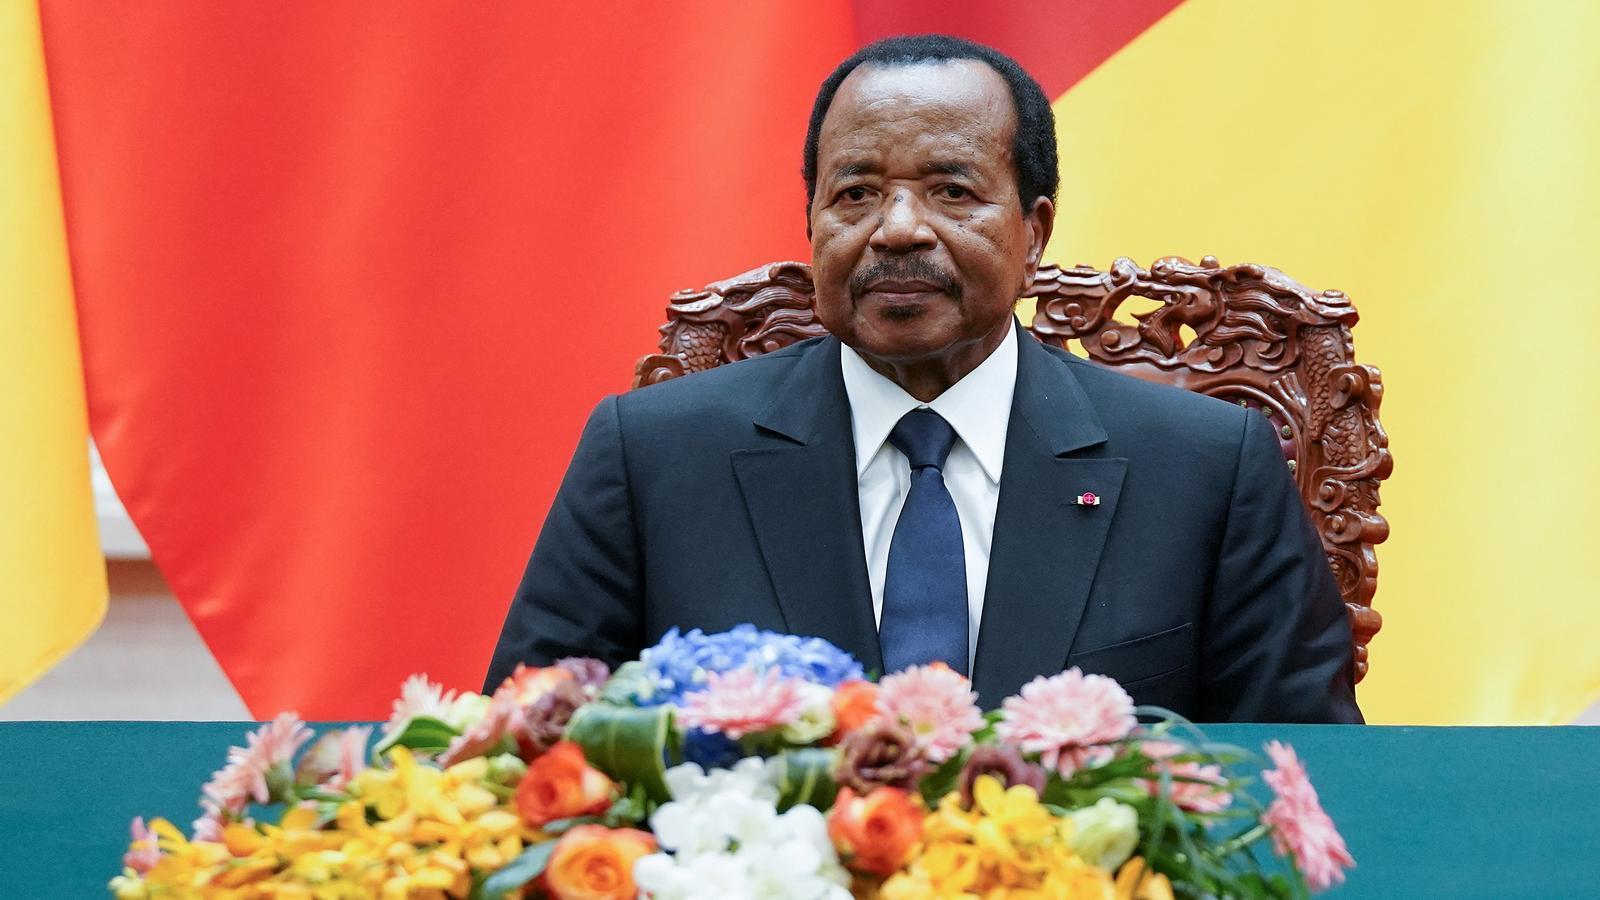 El president del Camerun, Paul Biya.